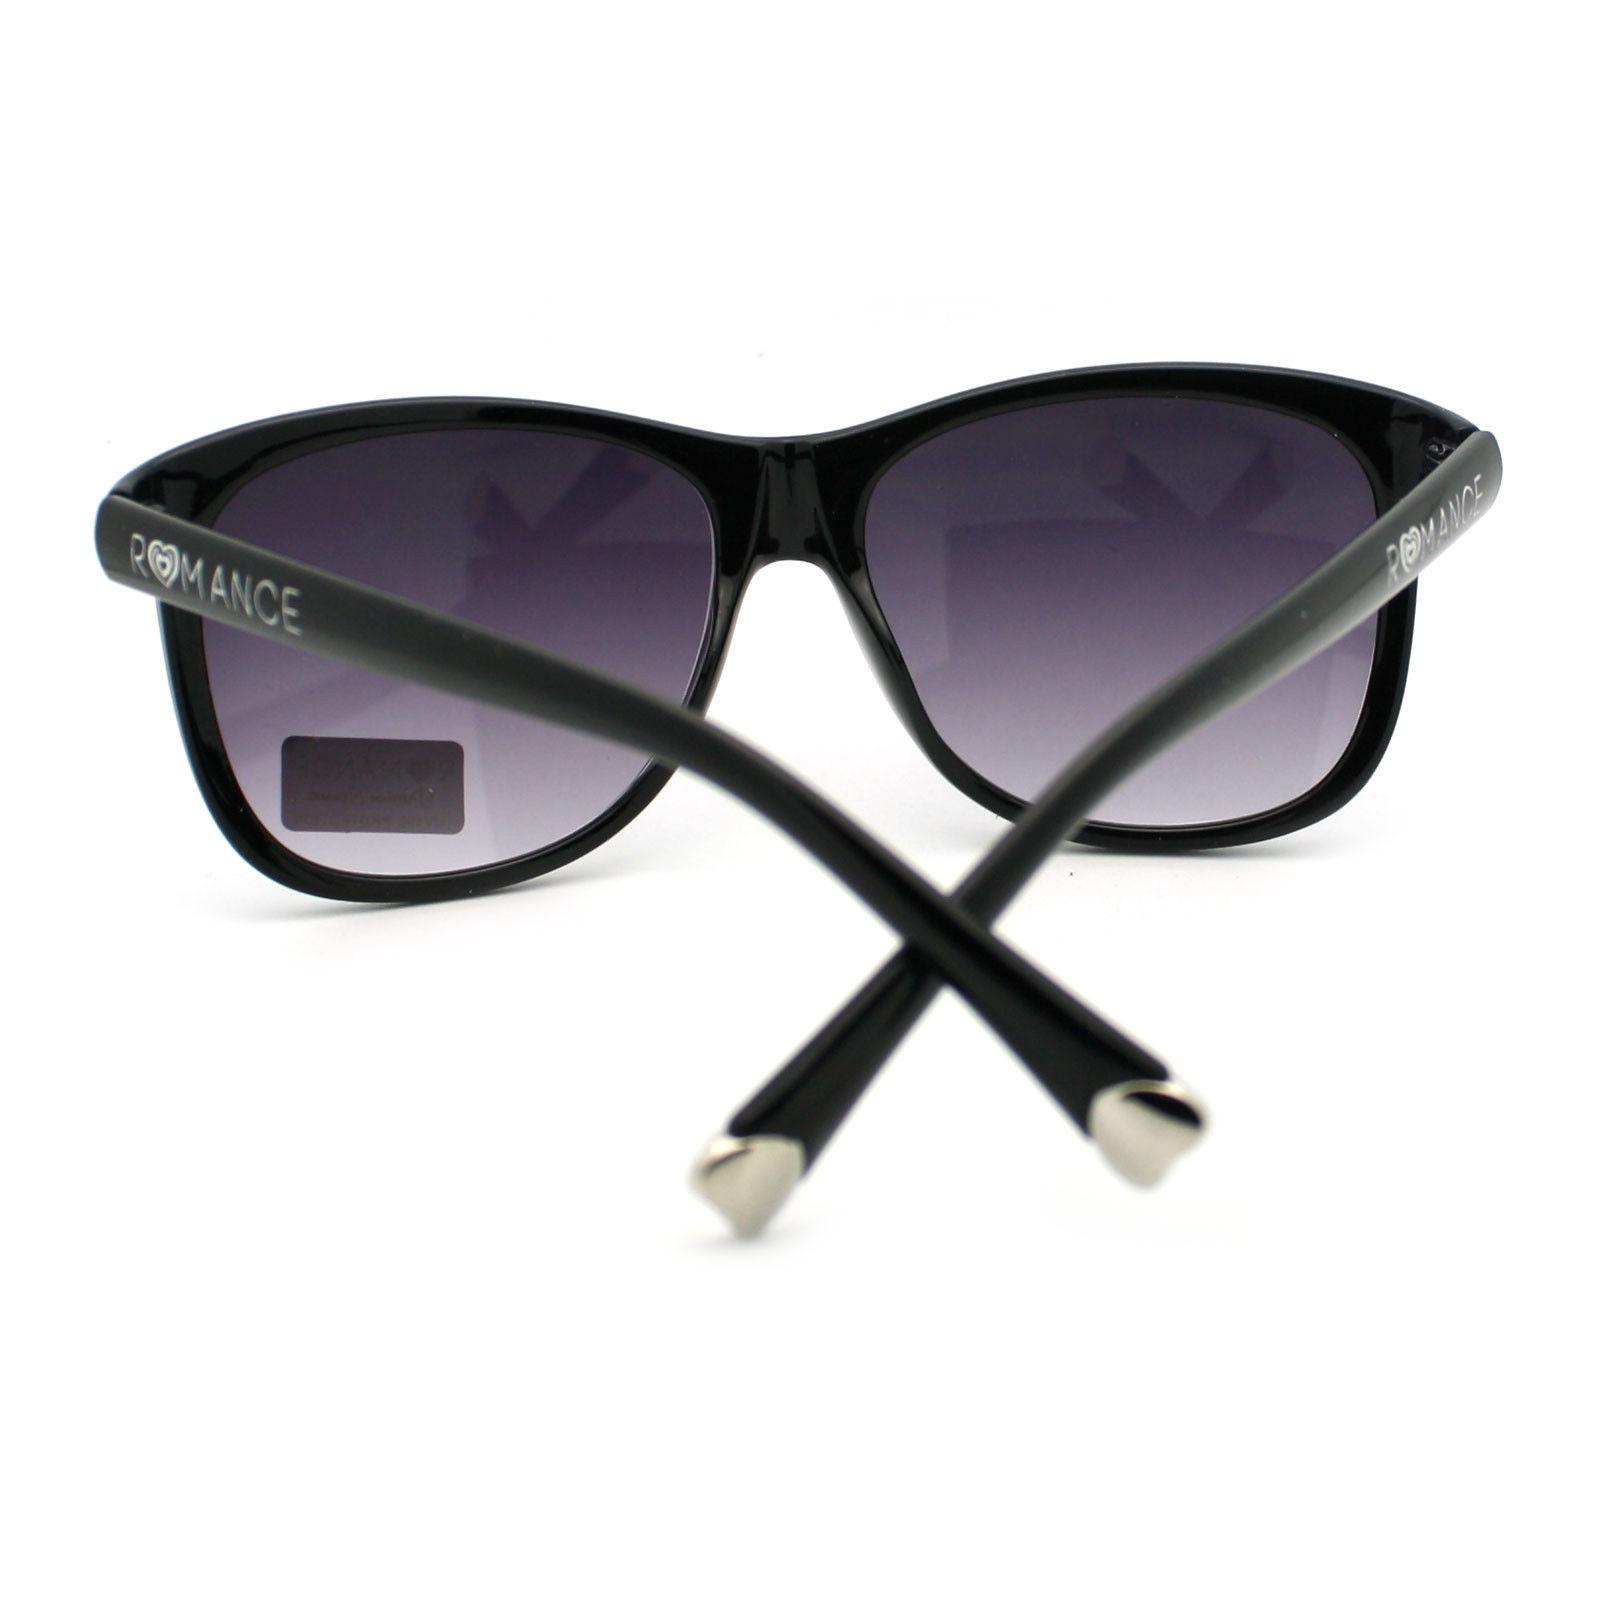 Romance Womens European Designer Fashion Retro Horn Rim Diva Sunglasses